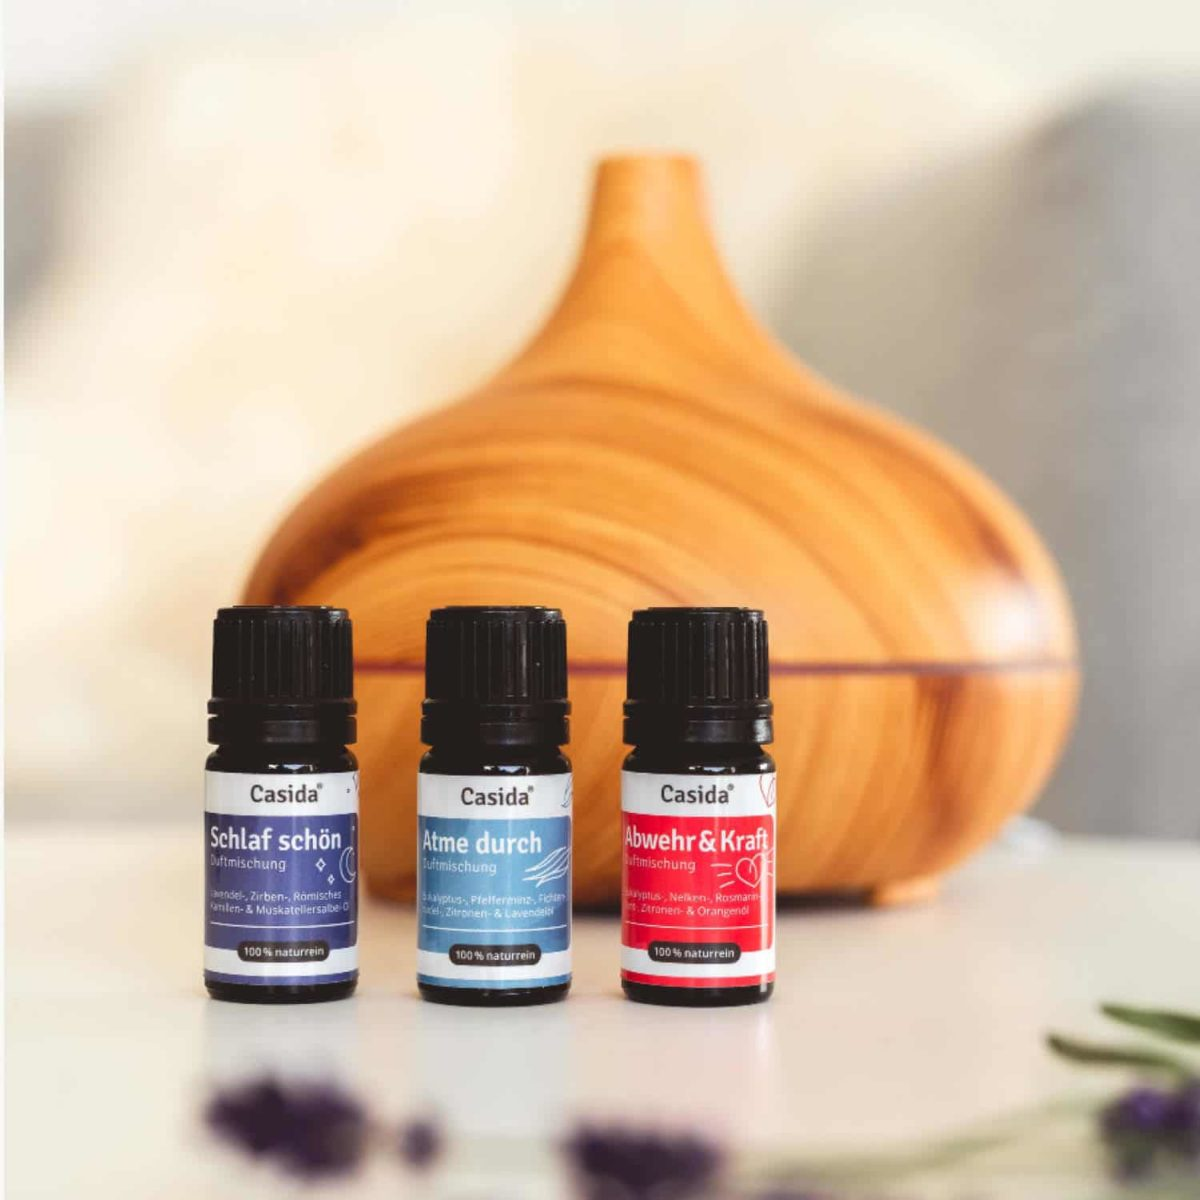 Casida Duftmischung Ruhe & Entspannung - 5 ml 17394517 PZN Apotheke Entspannung Aromatherapie Aromapflege Aromaschmuck Diffuser8